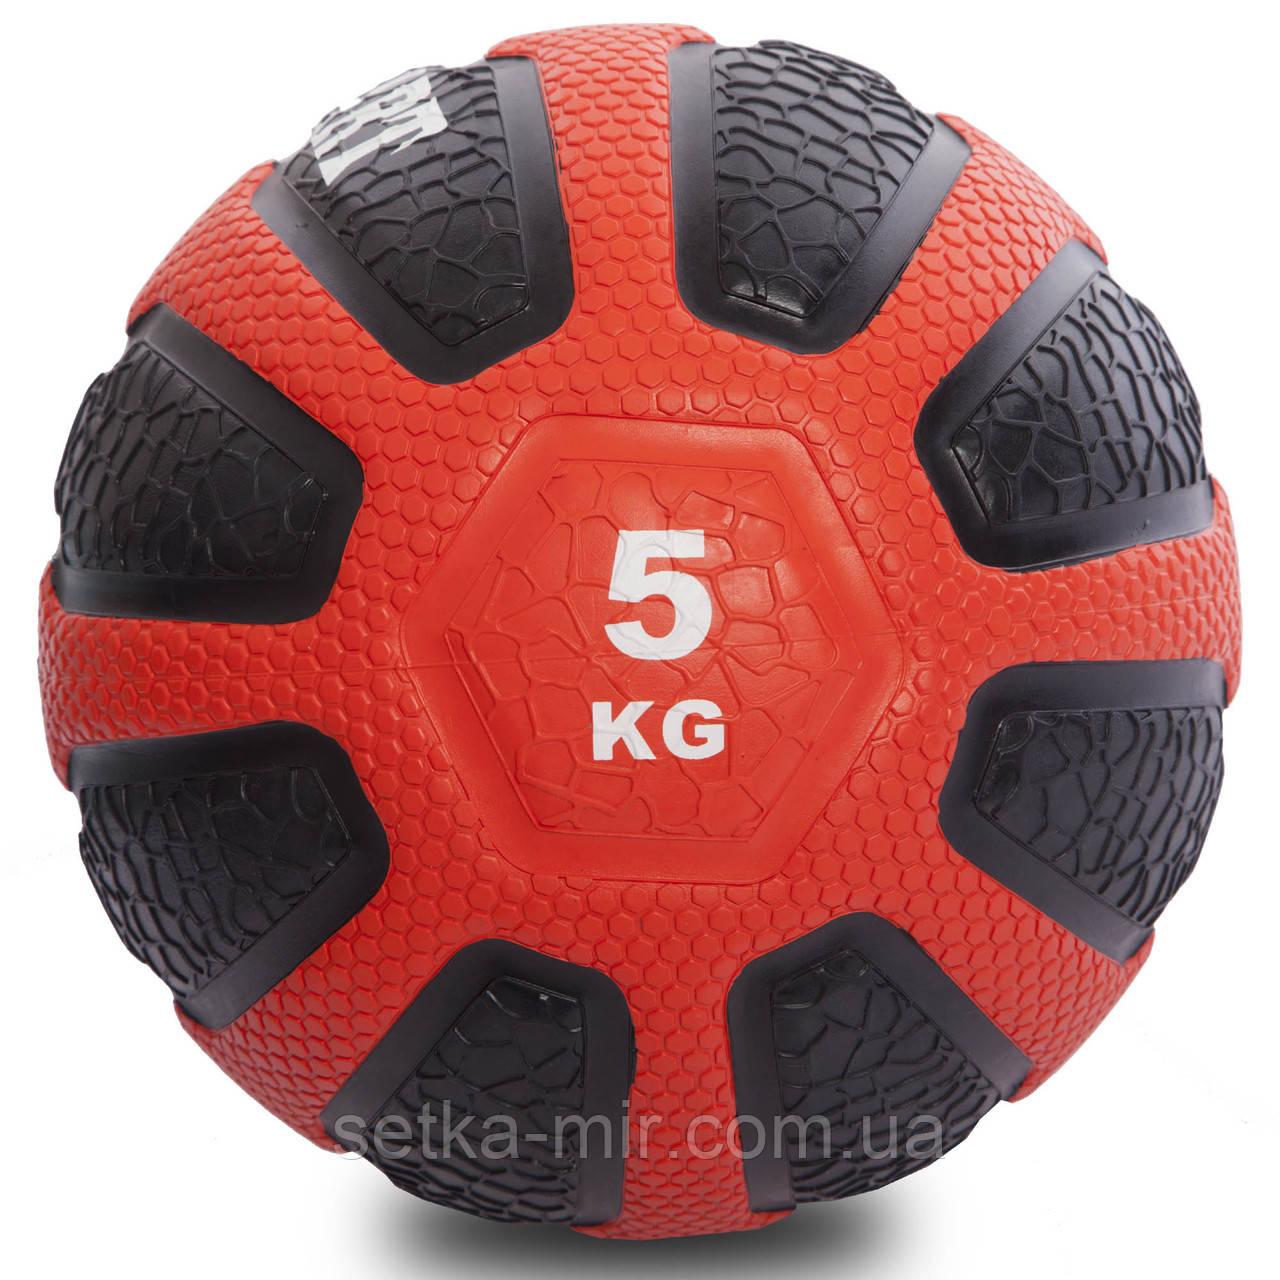 Мяч медицинский медбол Zelart Medicine Ball FI-0898-5 5кг